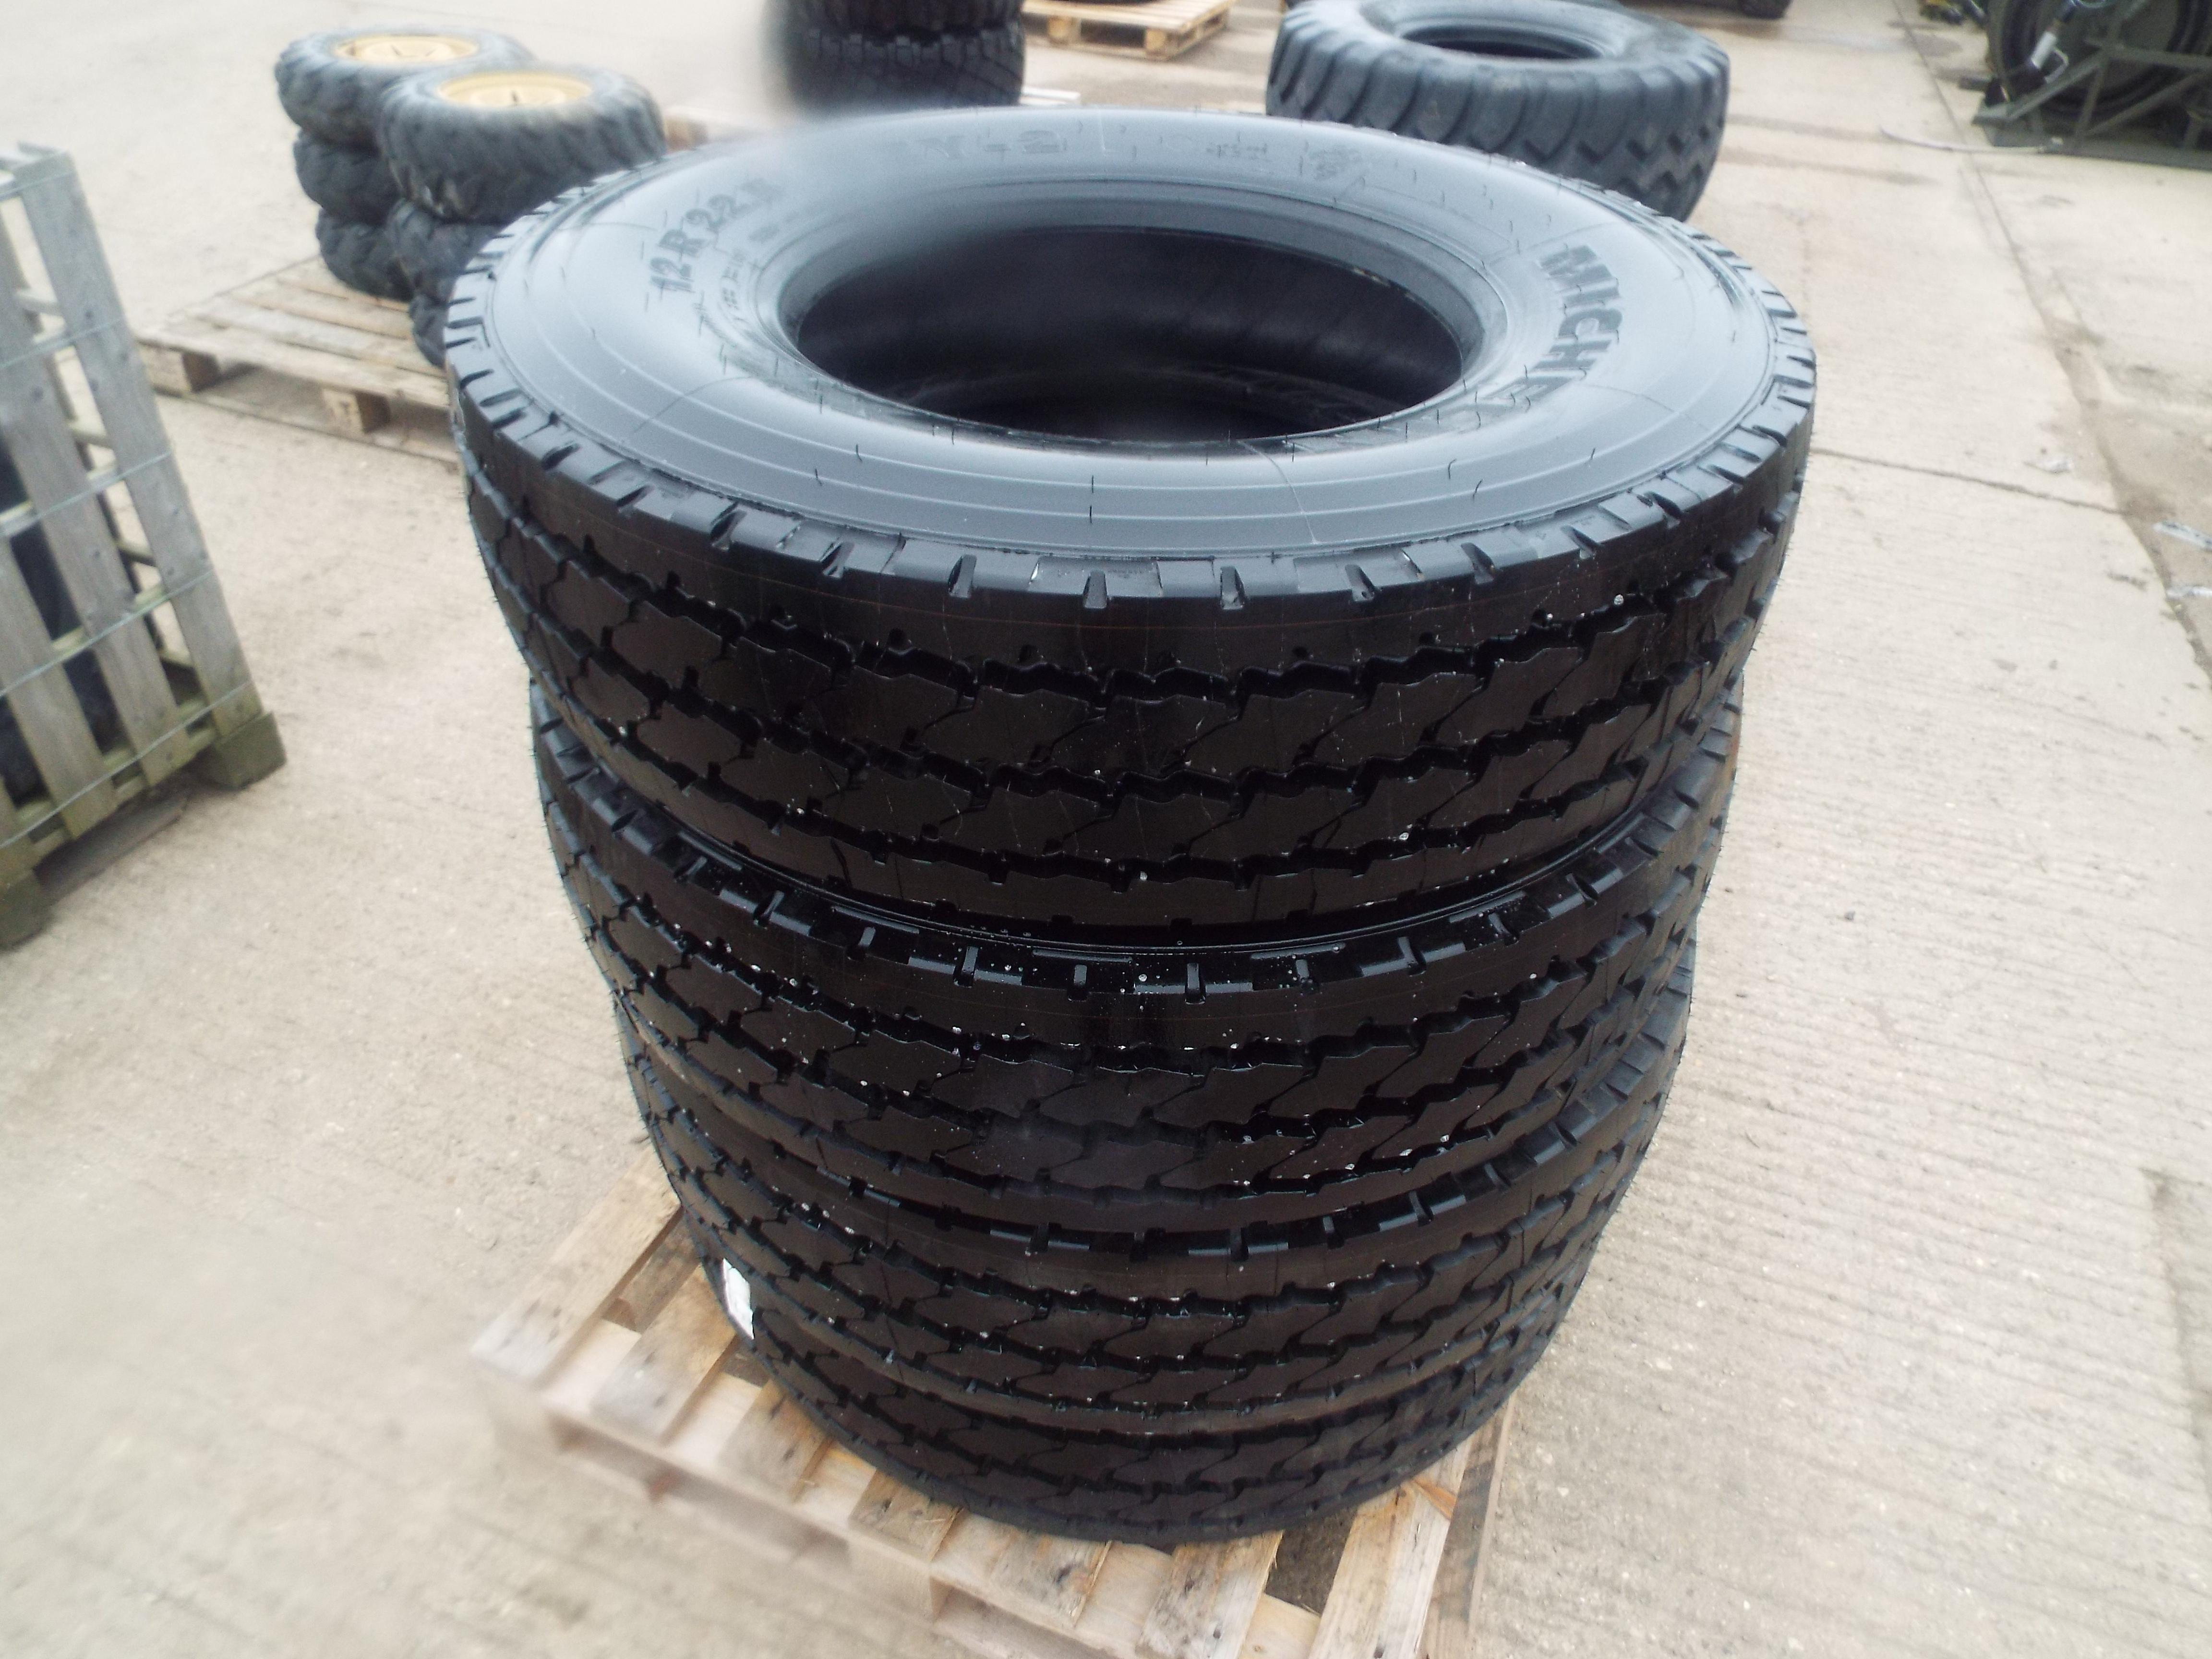 Lot 13611 - 4 x Michelin XZY-2 12.00 R22.5 Tyres